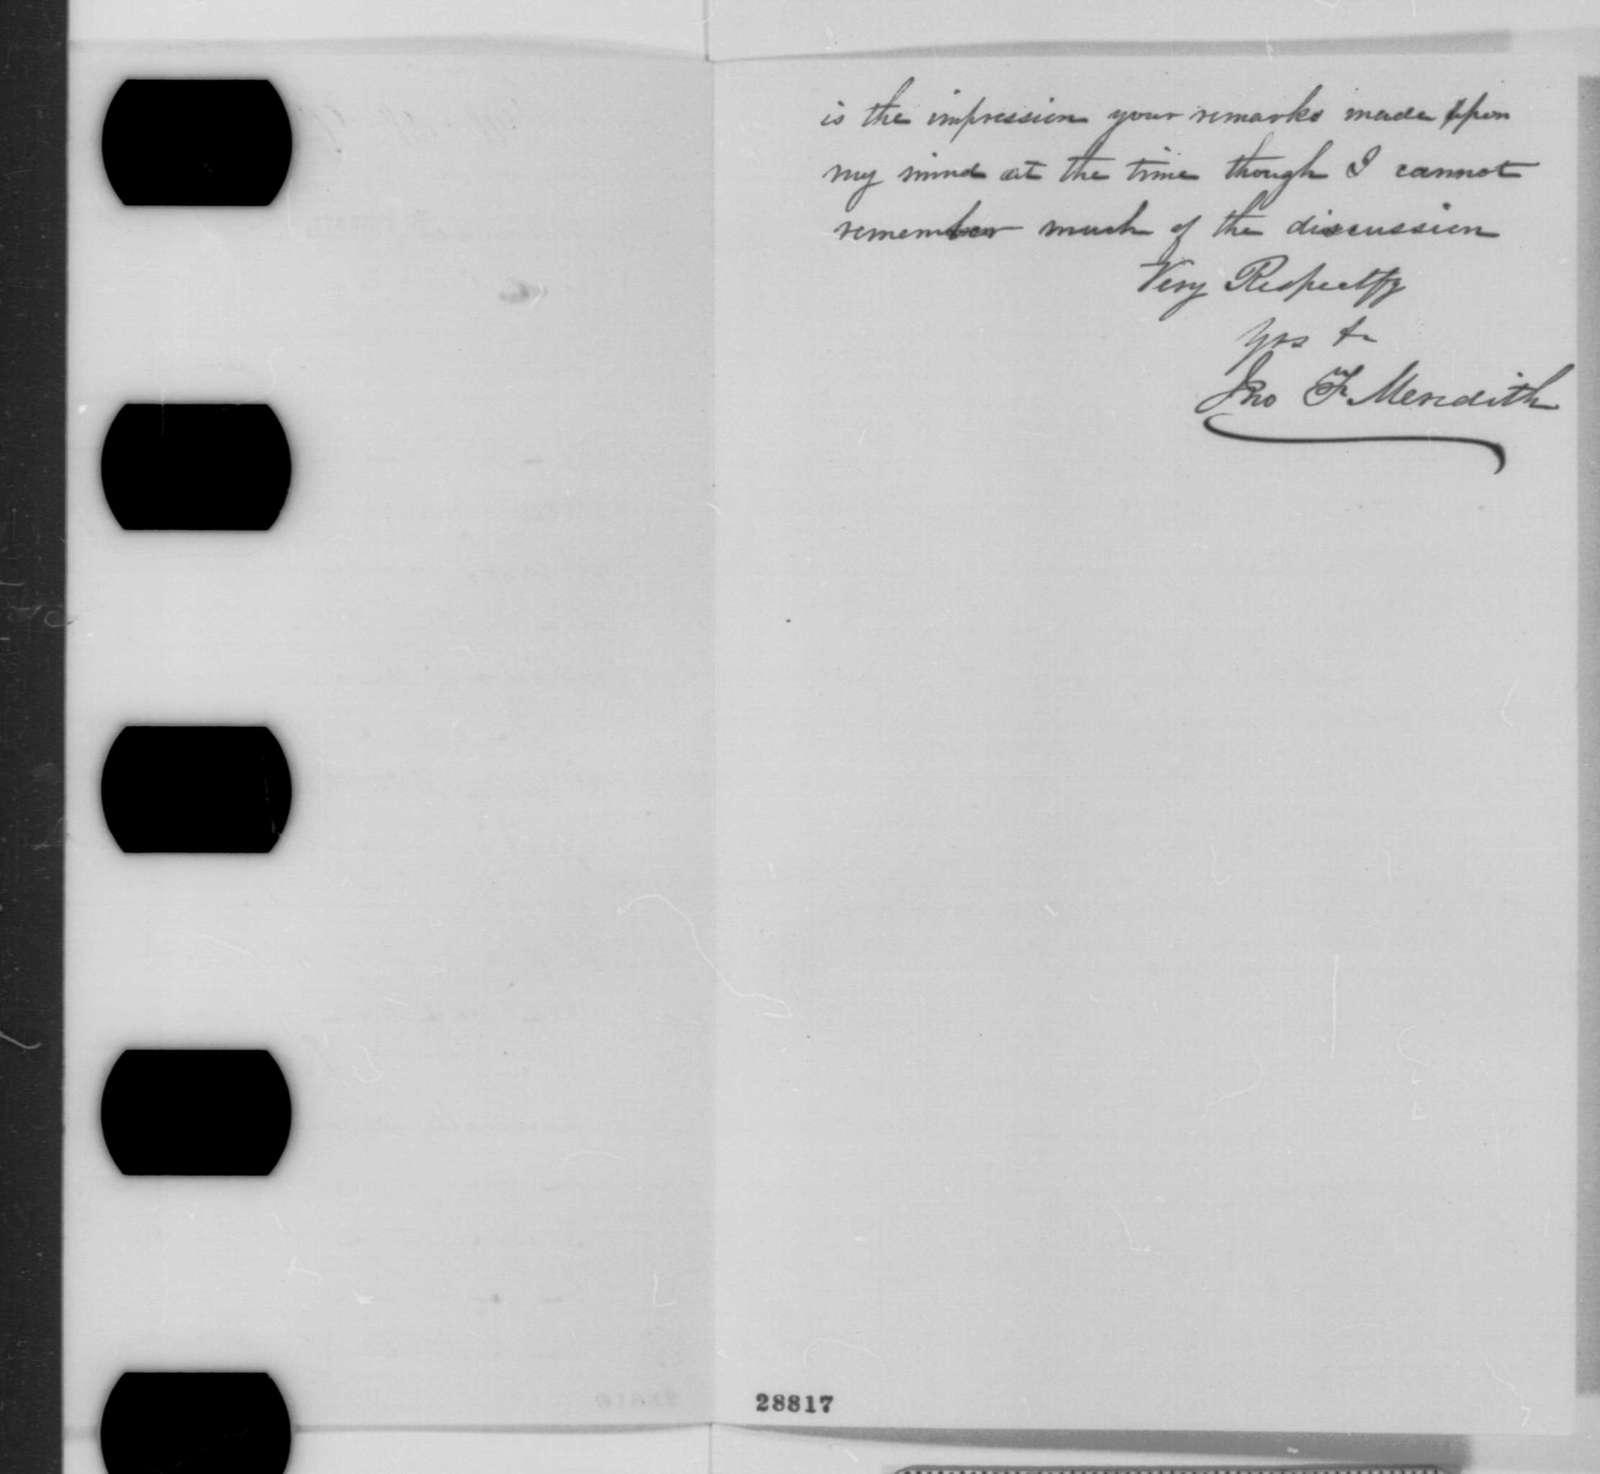 John F. Meredith to James L. Ridgely, Monday, December 21, 1863  (Ridgely's position on emancipation)